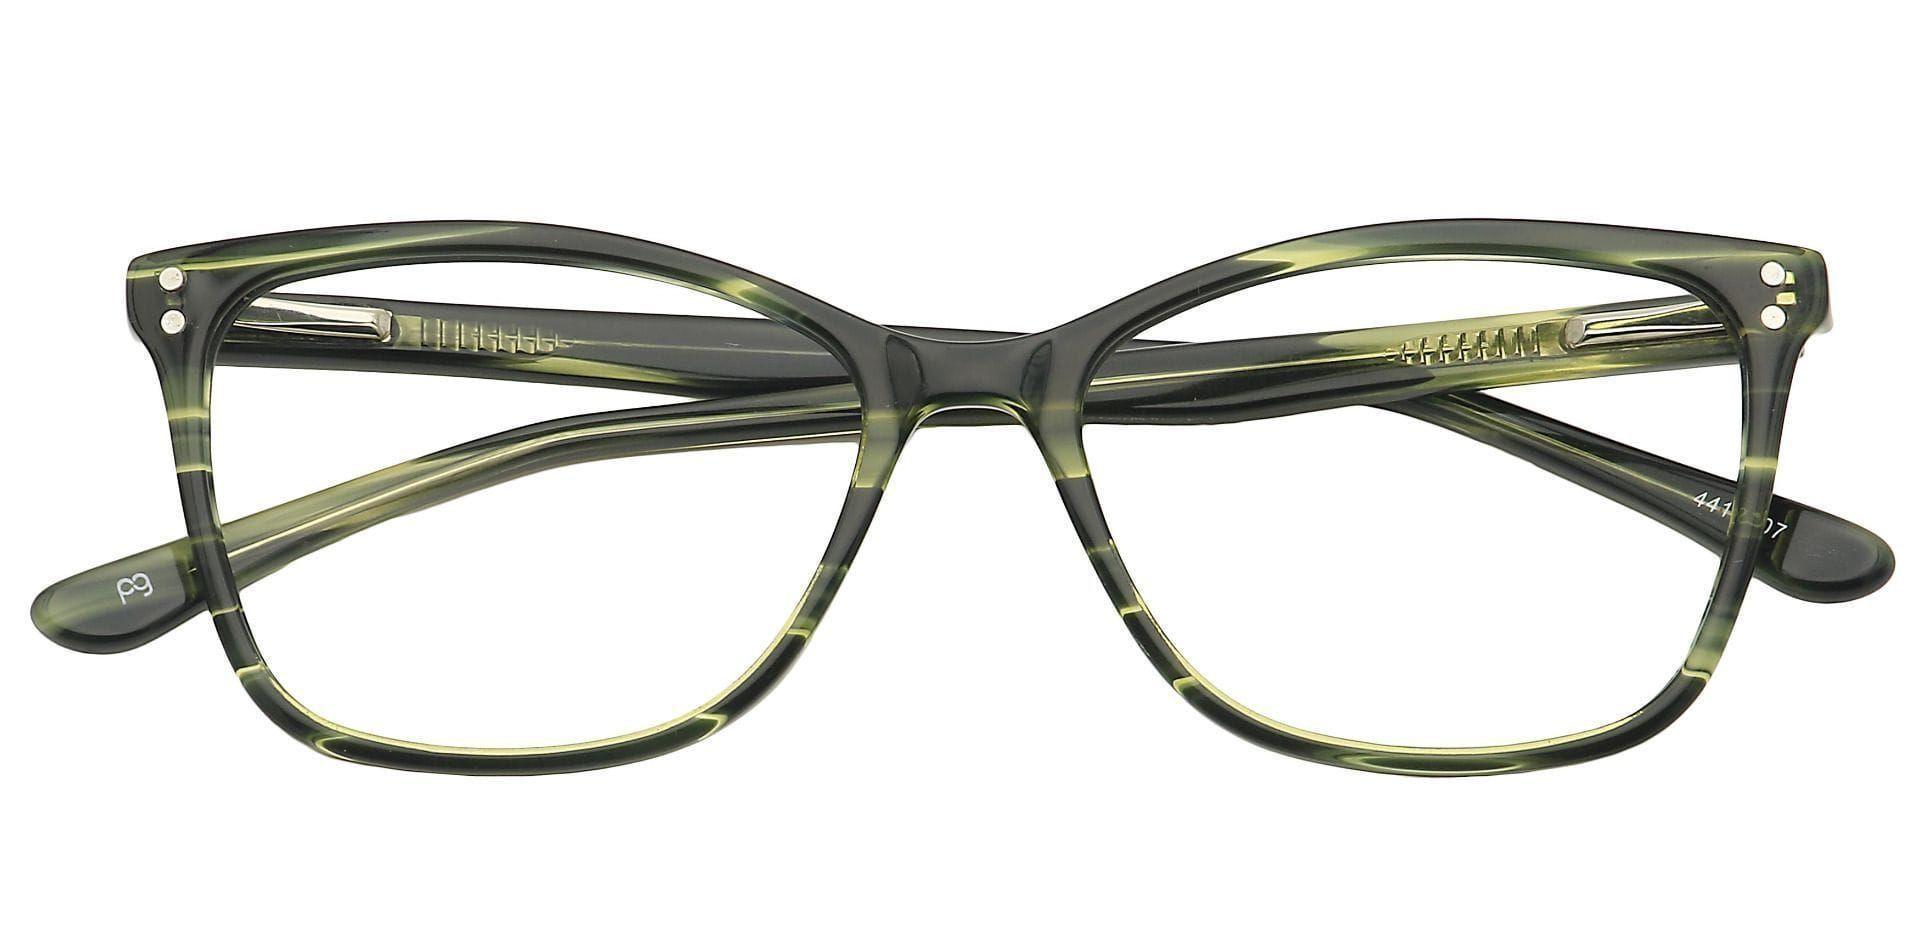 Jett Oval Prescription Glasses - Green